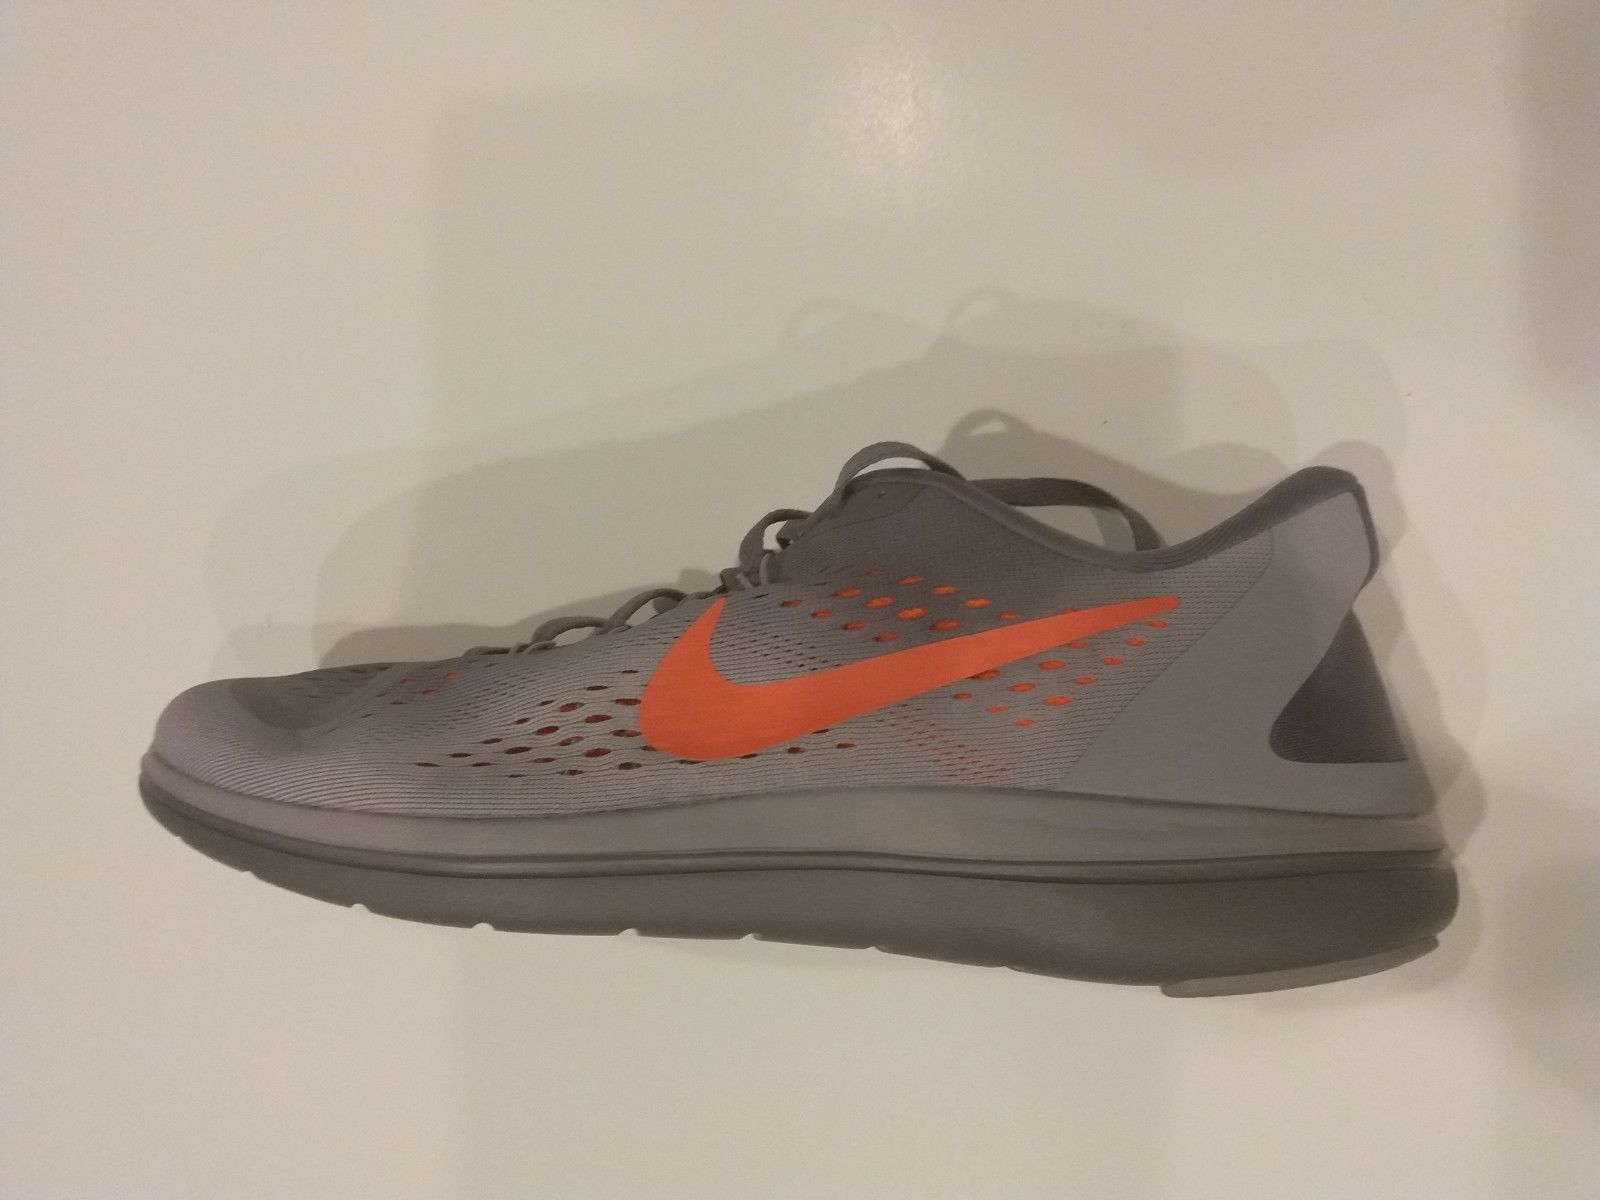 2762af94d3d67 Nike Flex 2017 RN 898457-014 Gunsmoke Grey Black Crimson Men s Running